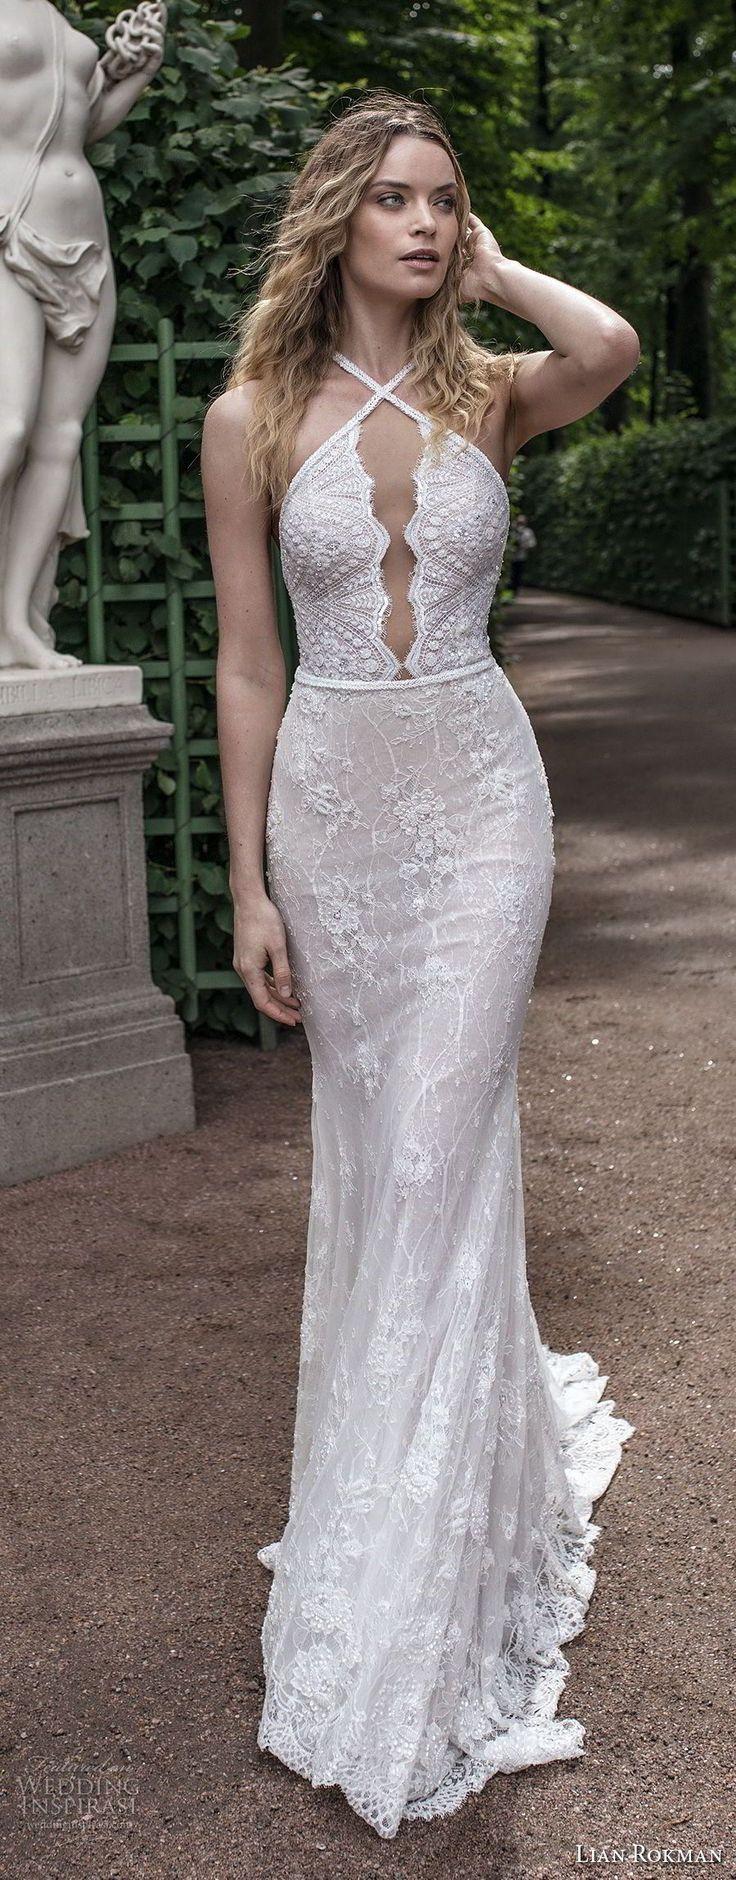 lian rokman 2018 bridal sleeveless halter neck keyhold bodice full embellishment elegant sexy sheath fit and flare wedding dress open back medium train (3) mv -- Lian Rokman 2018 Wedding Dresses